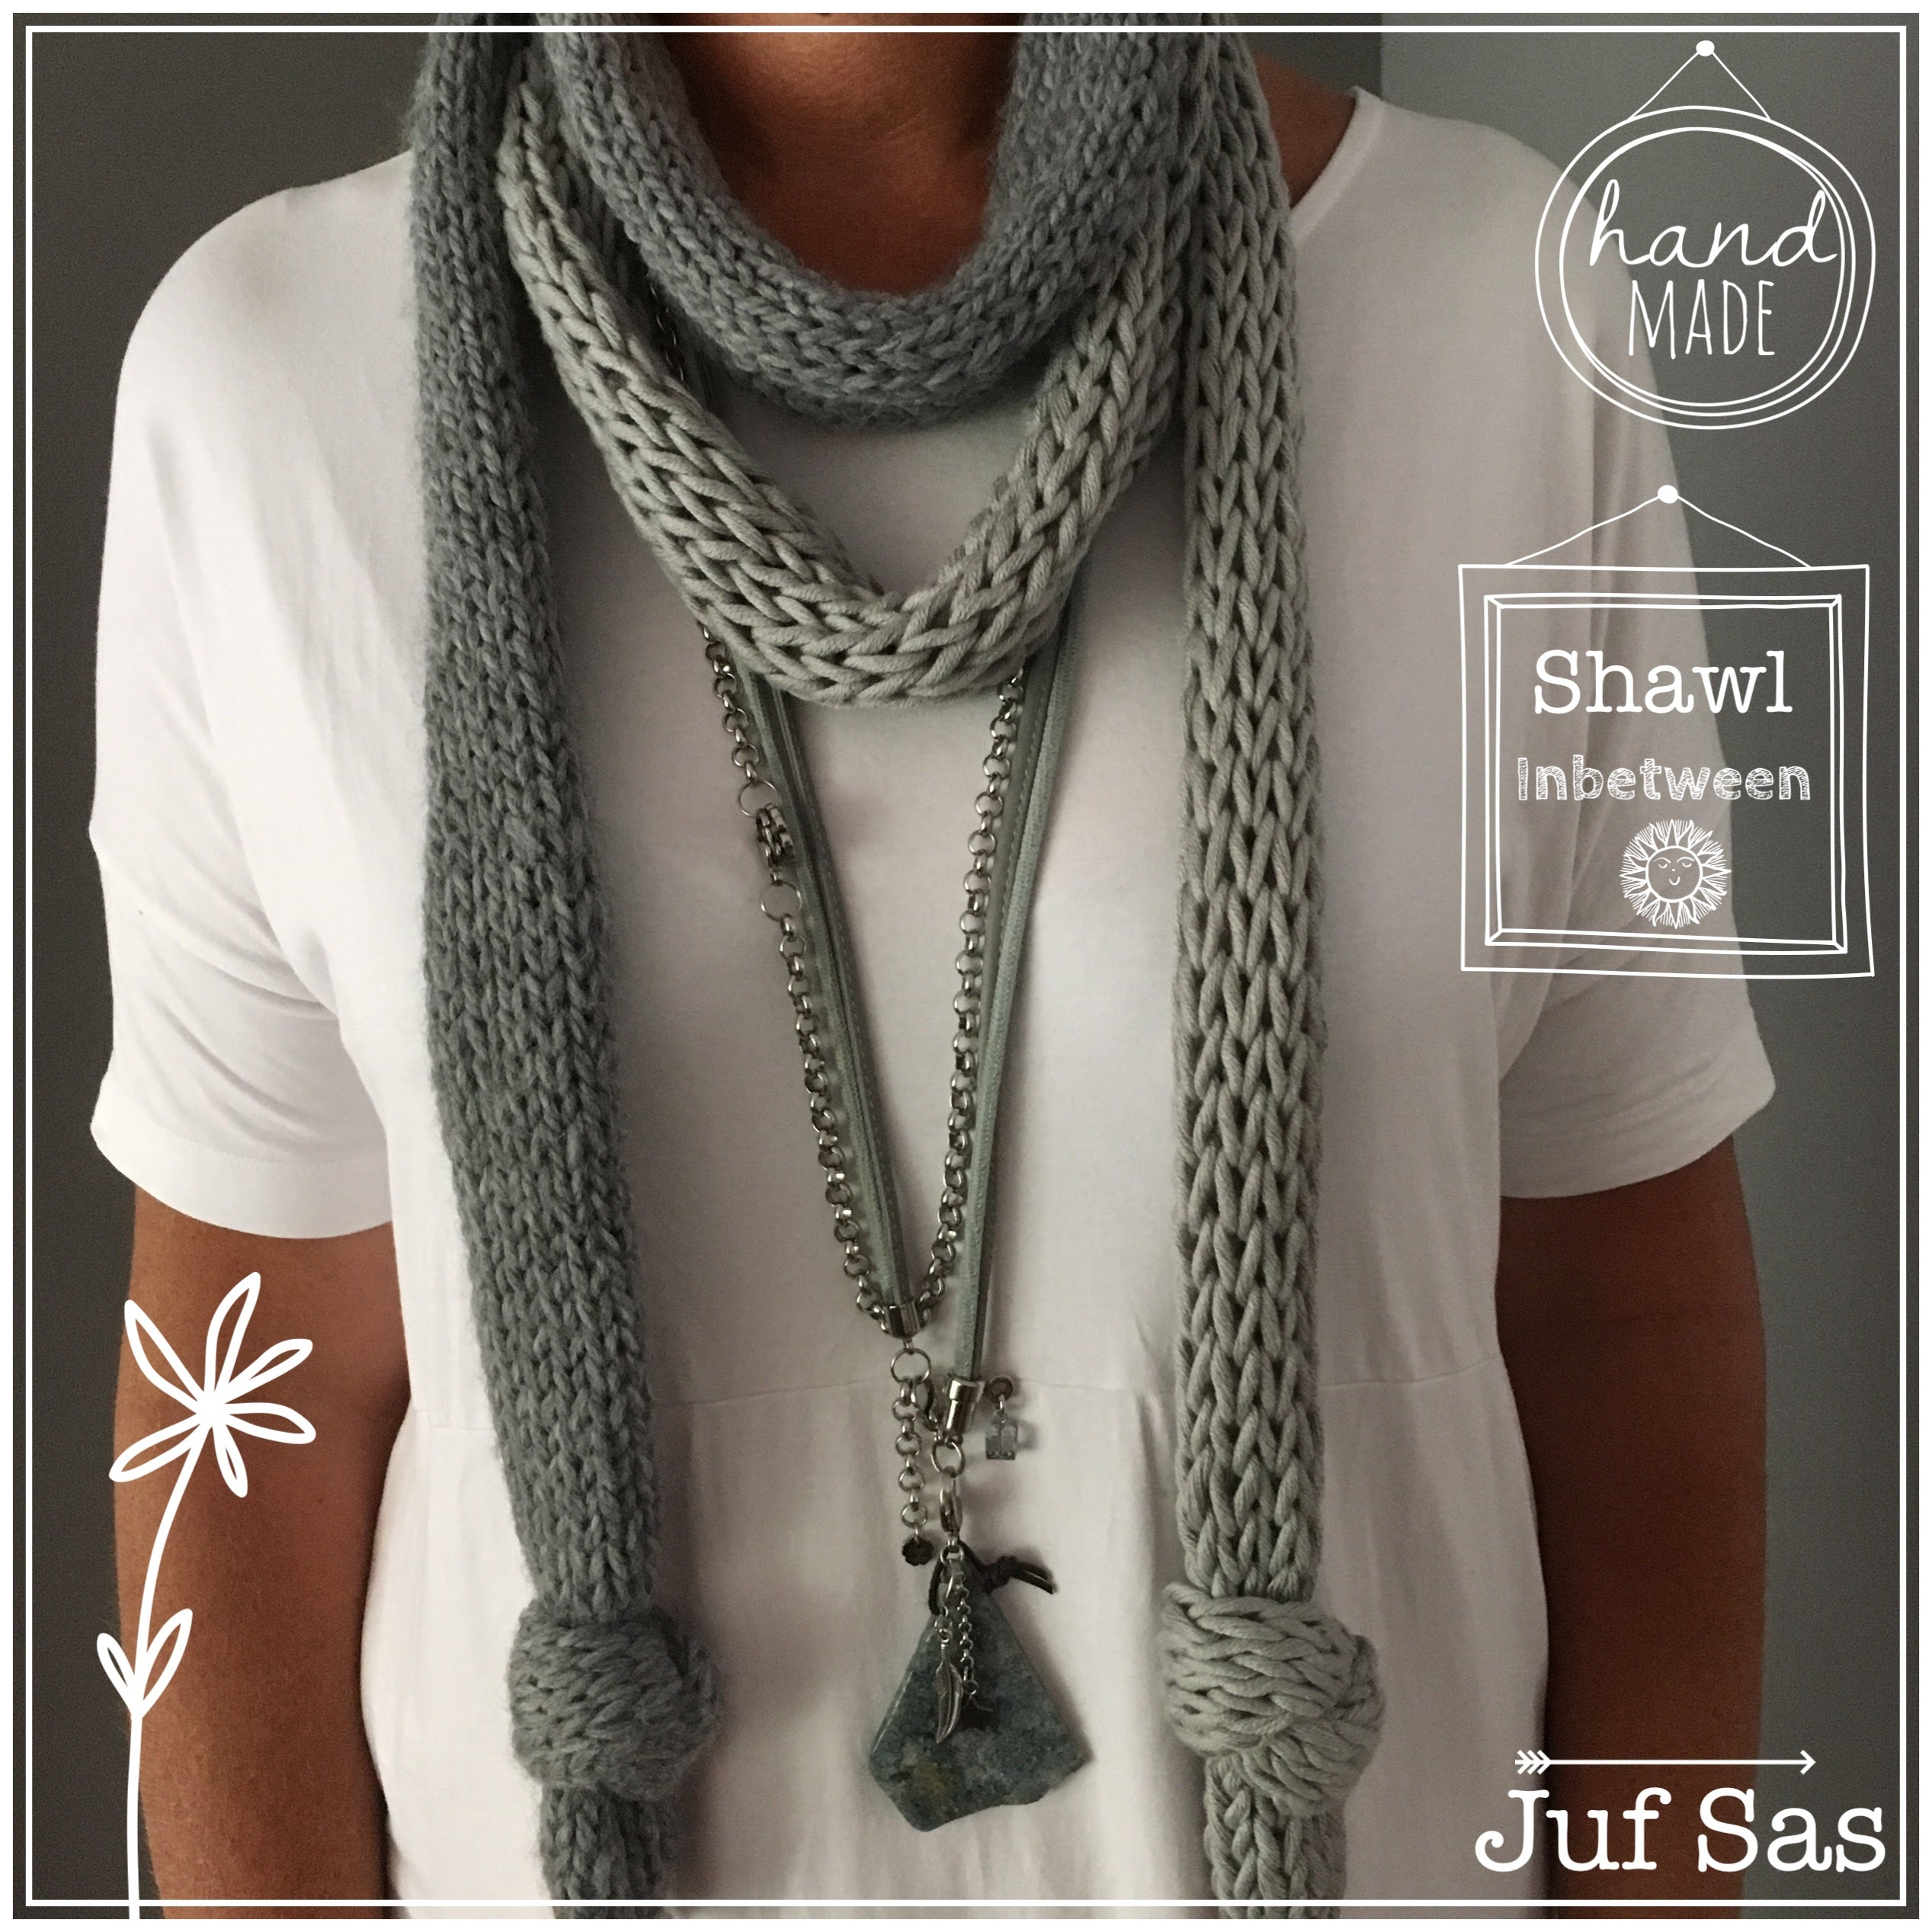 Shawl Inbetween